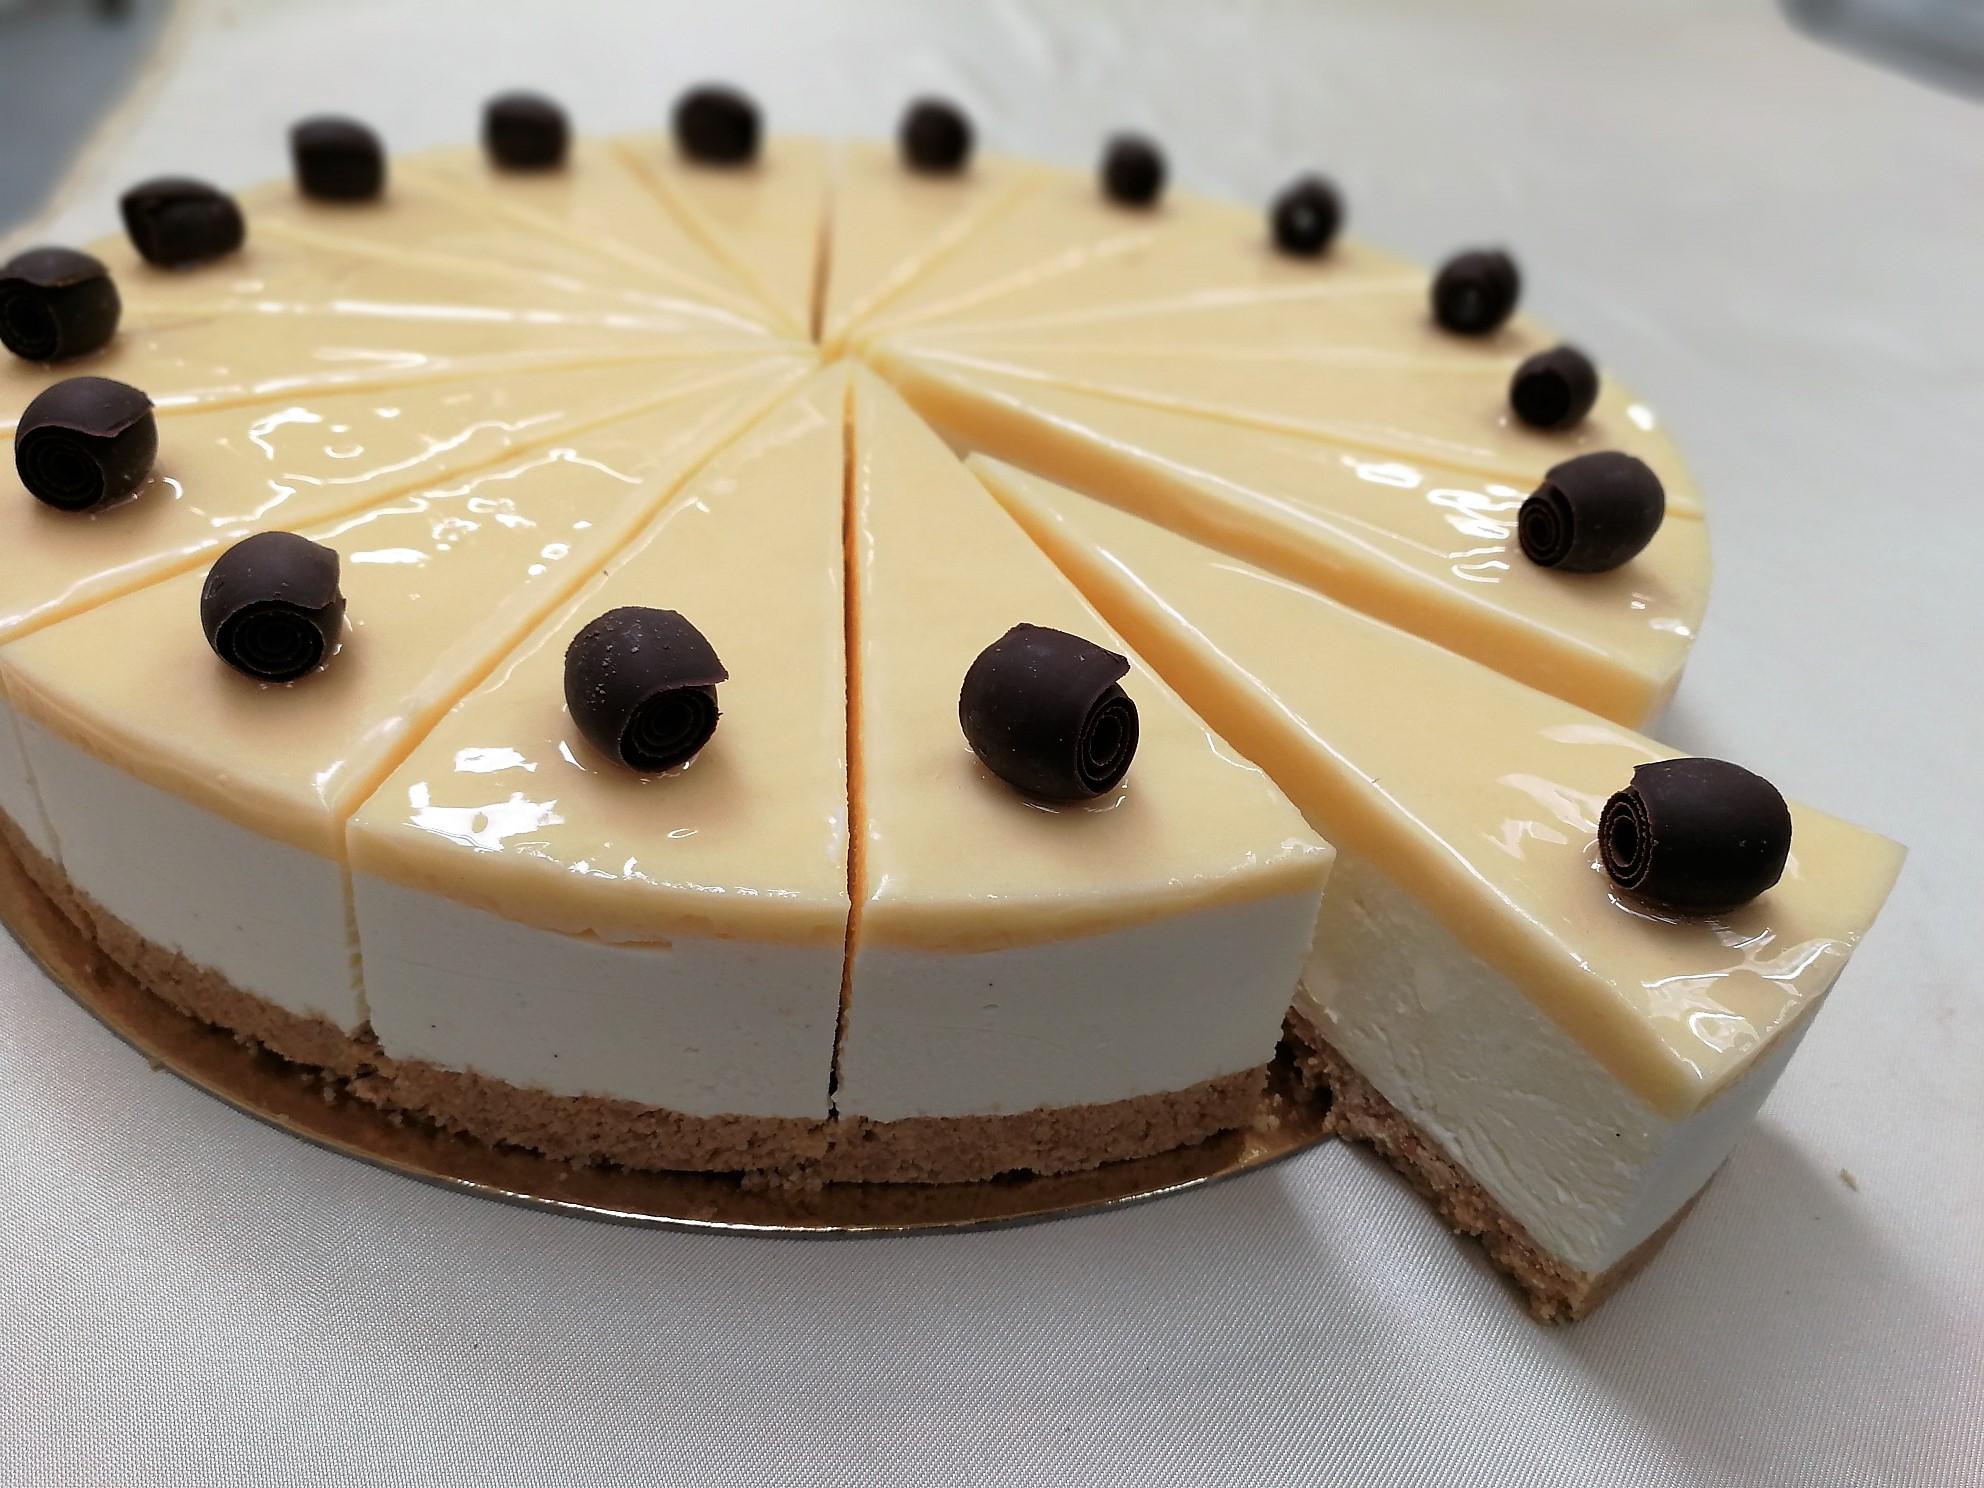 Lemon Curd Cheesecake 16 Presliced Portions